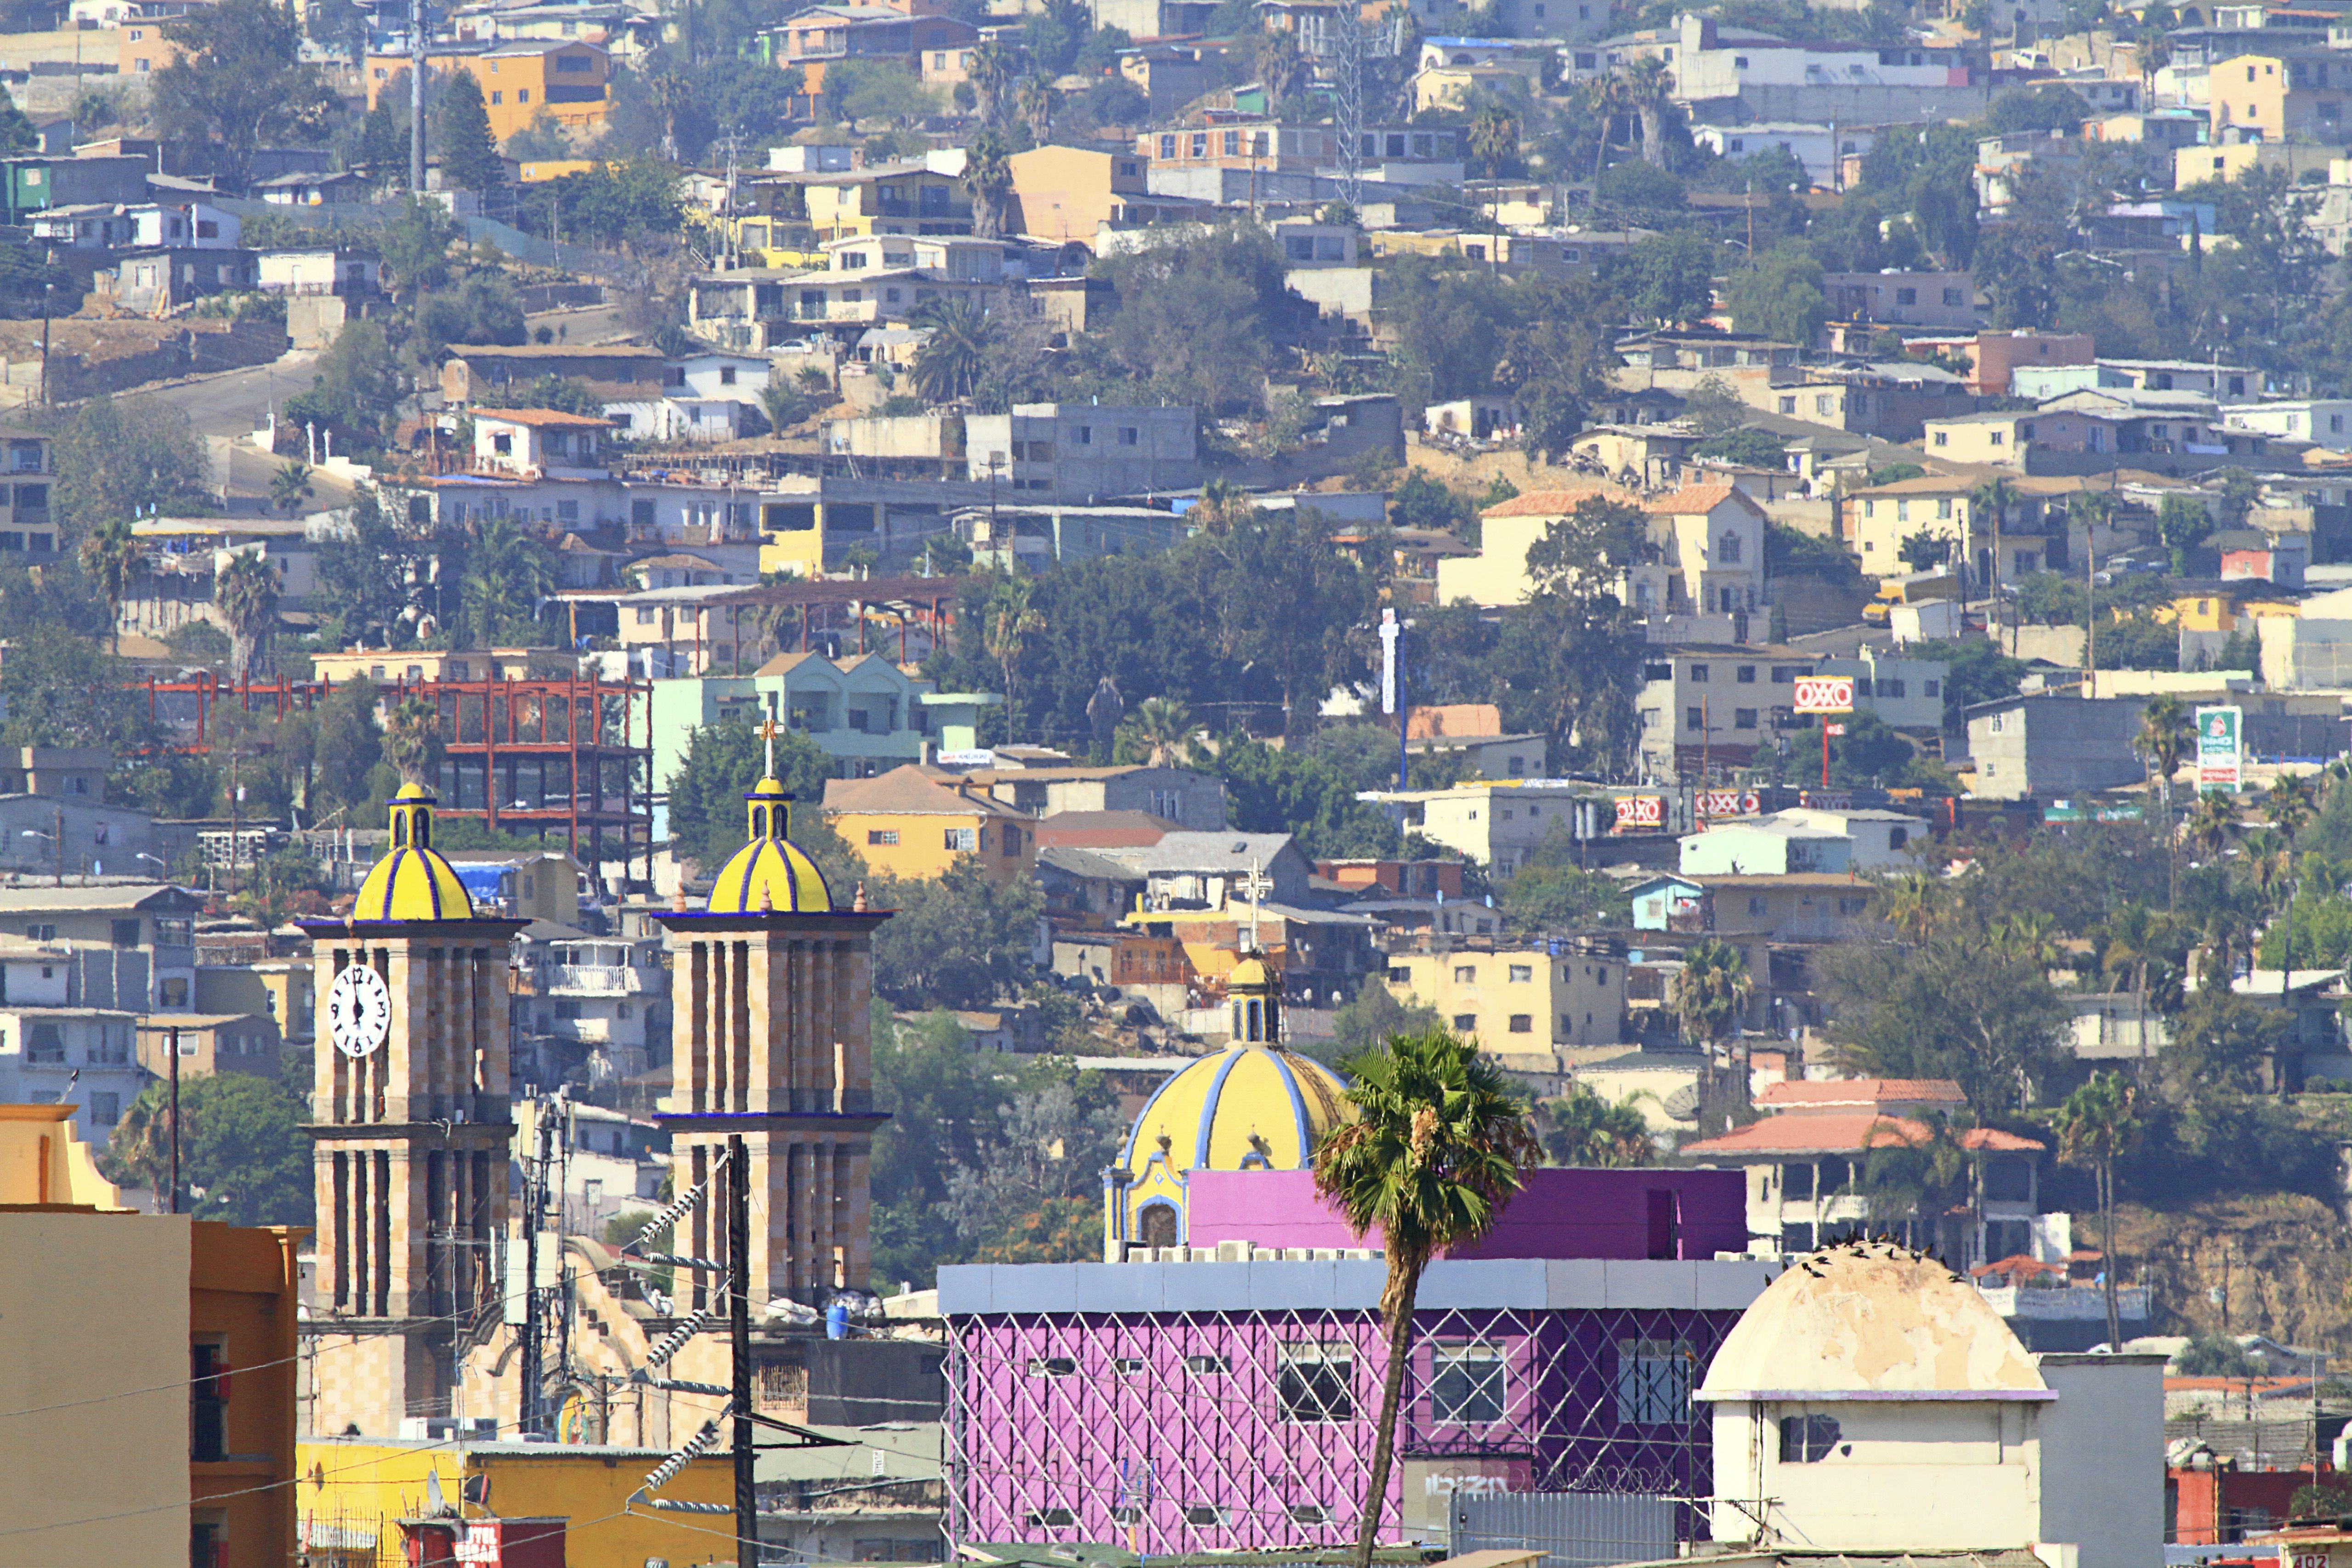 Mexico. Tijuana. Catedral de Nuestra Seora de Guadalupe